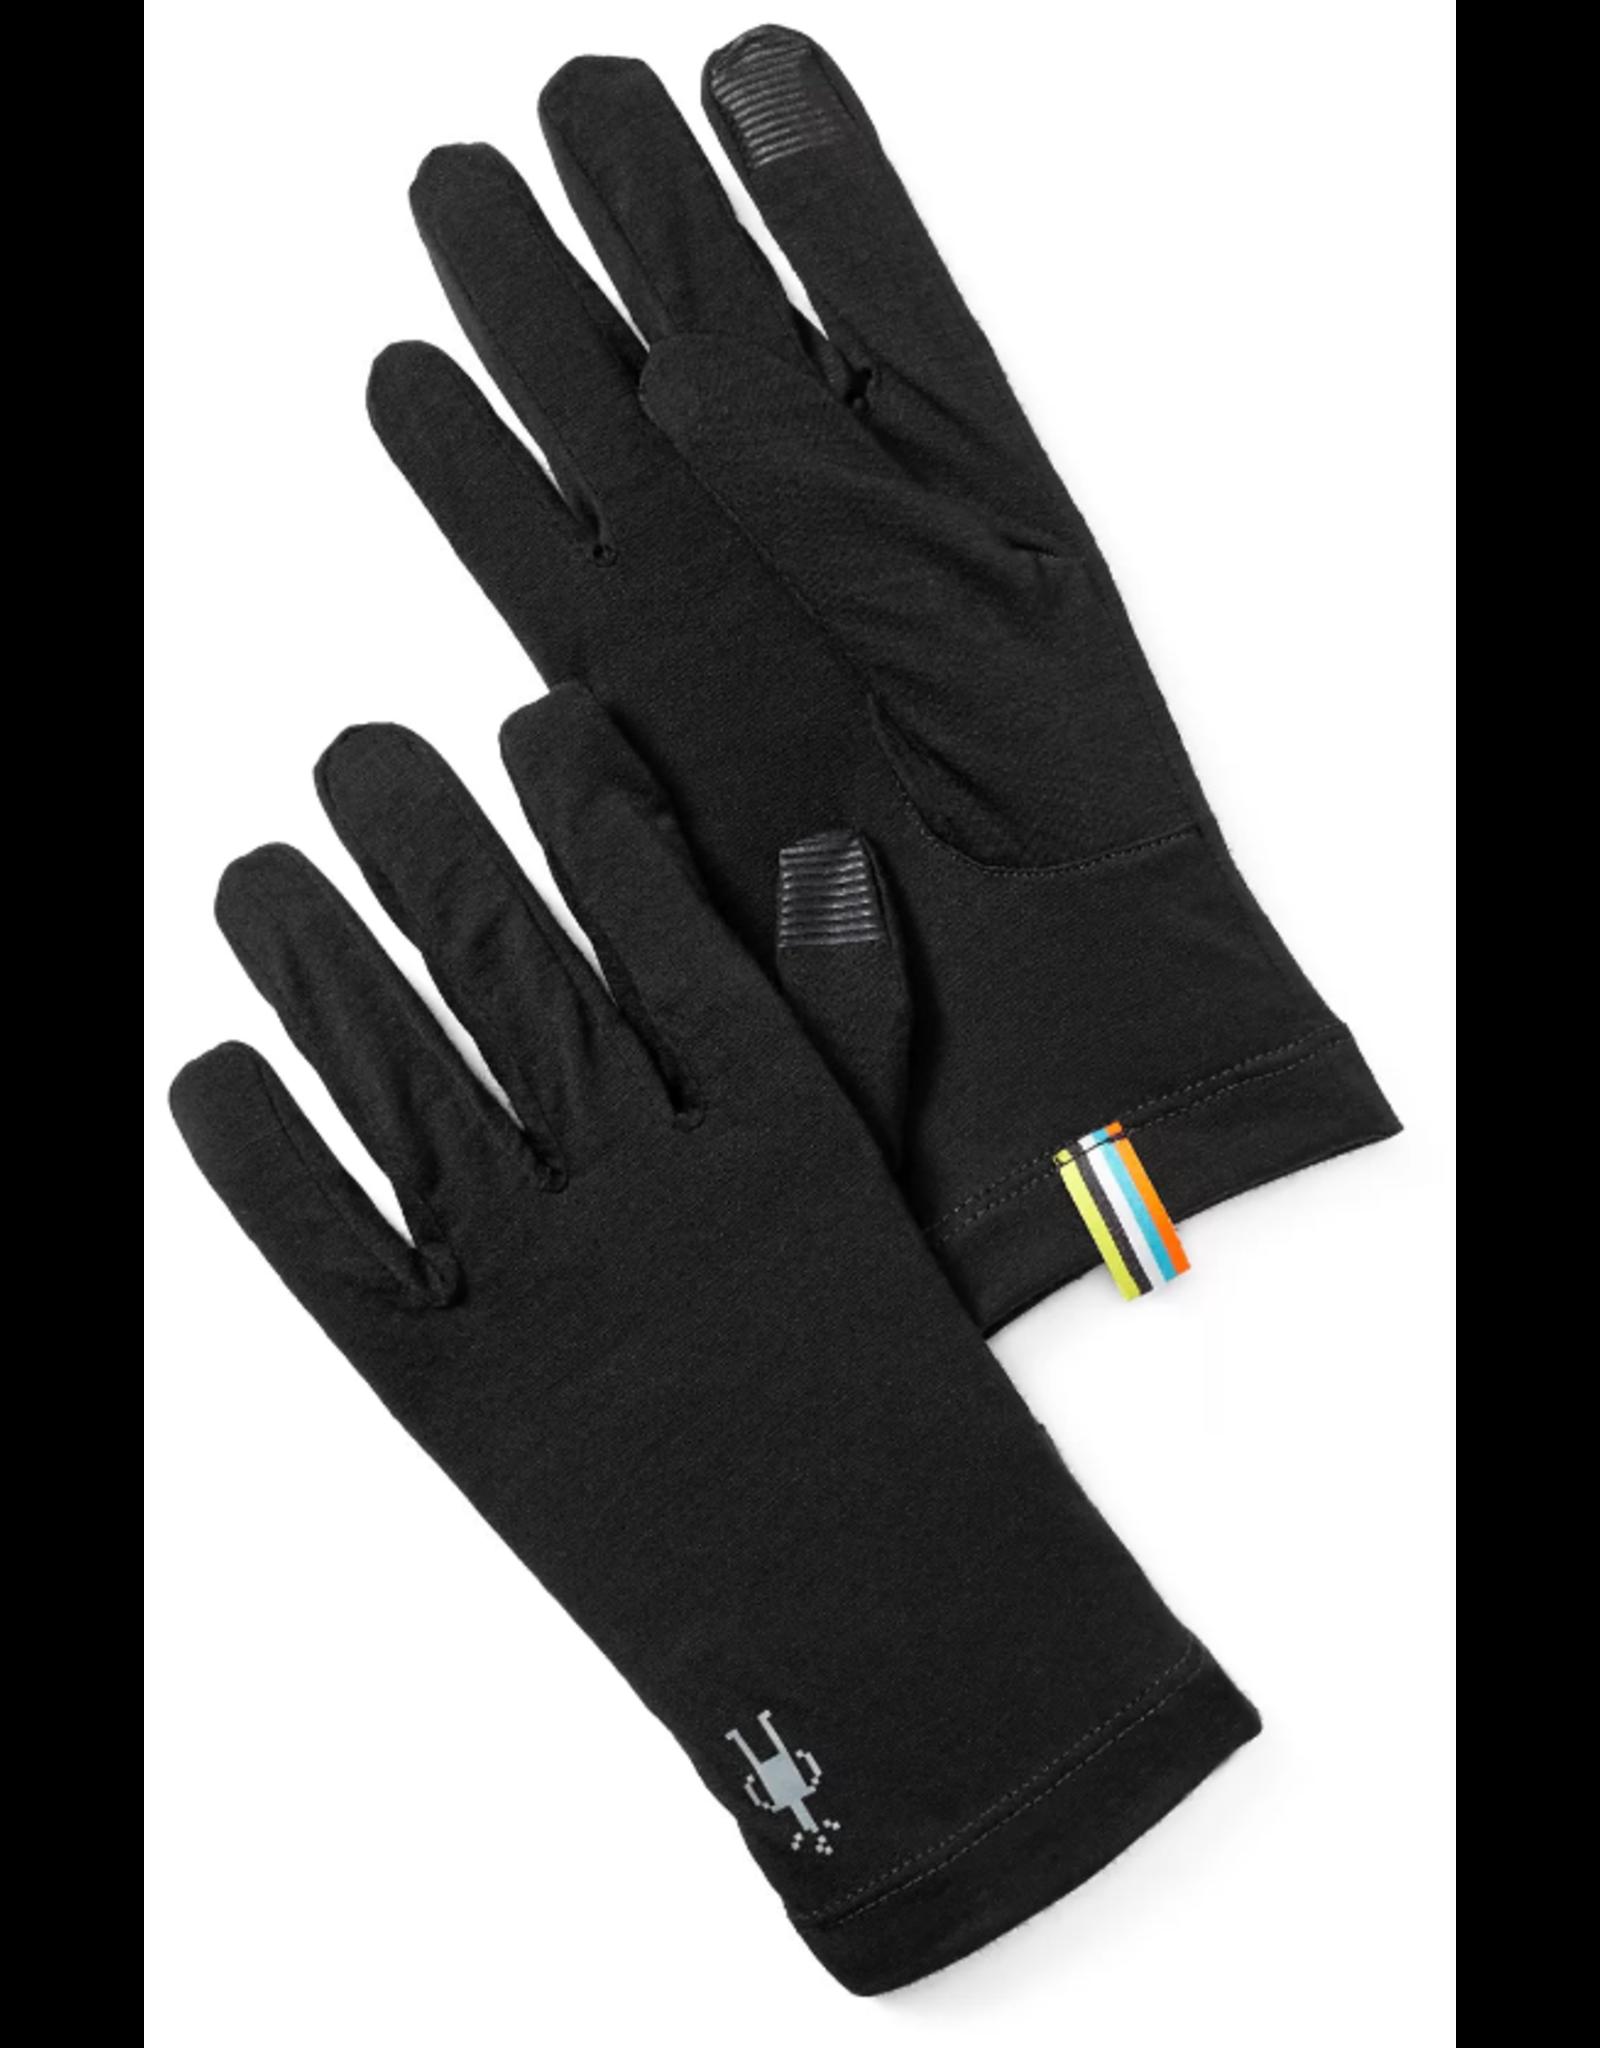 SMARTWOOL SmartWool 150 Glove black